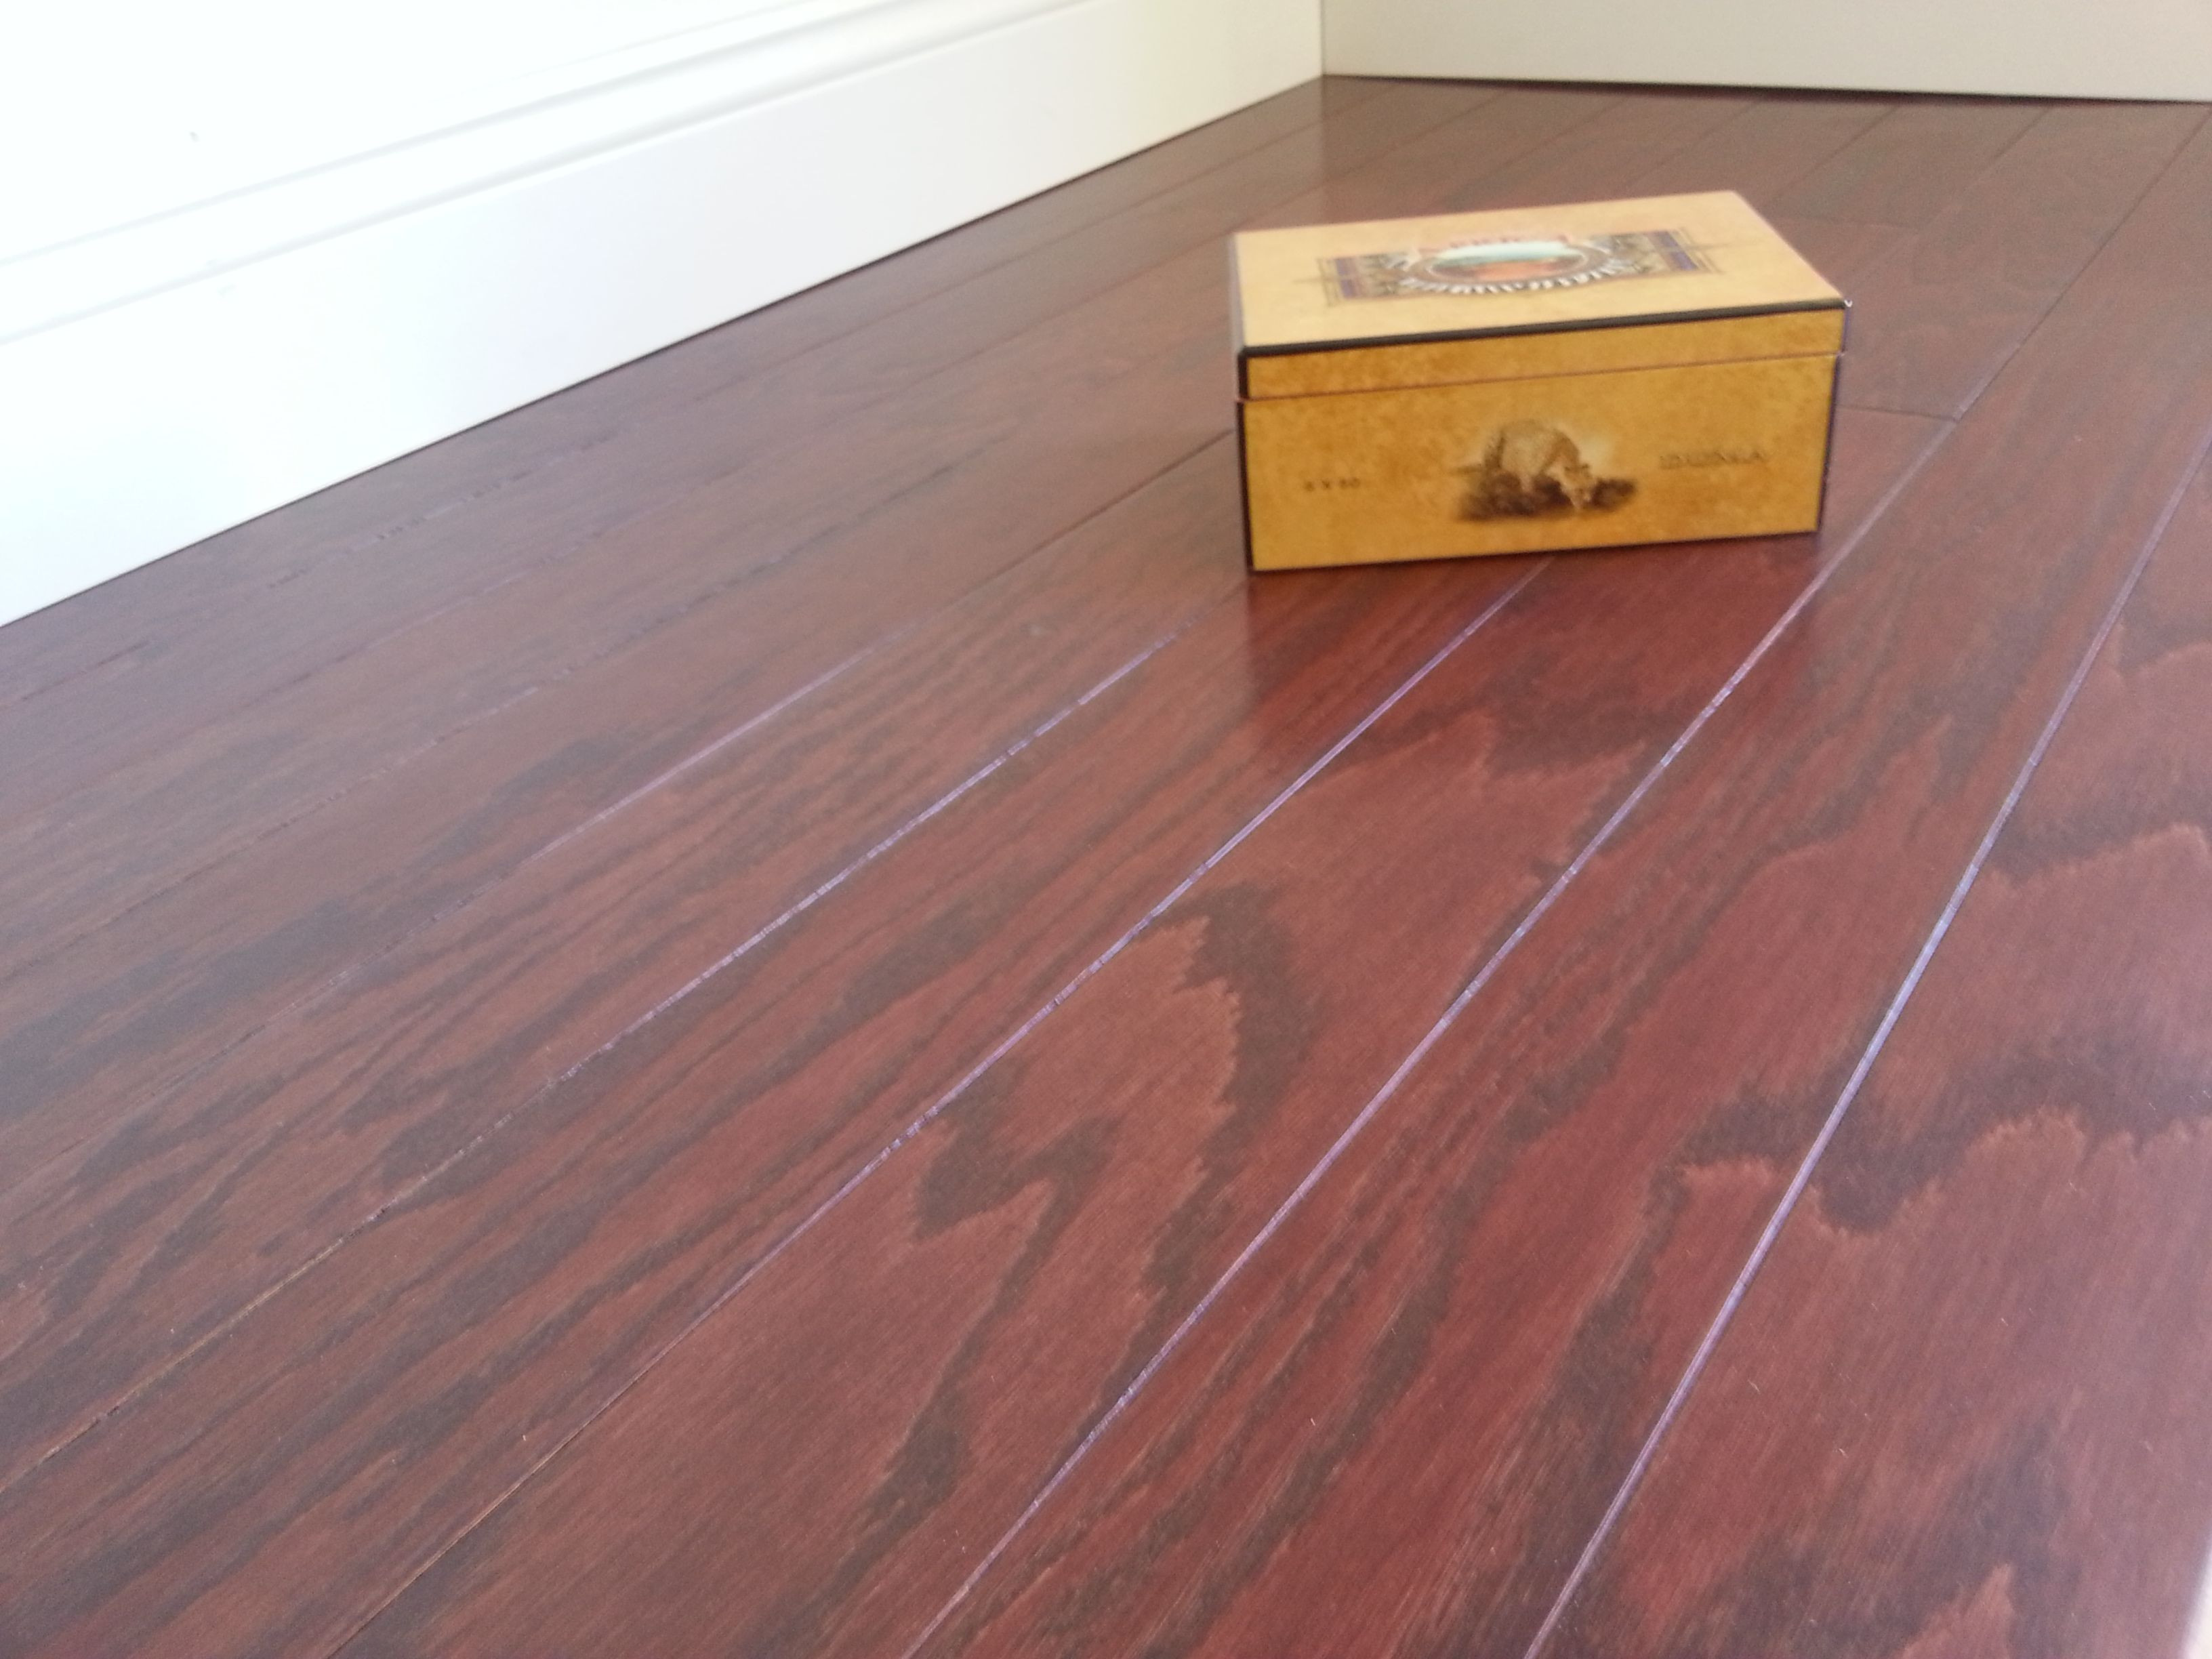 4 hardwood flooring of 3 1 4 symphonic engineered oak merlot hardwood flooring as low as for 3 1 4 symphonic engineered oak merlot hardwood flooring as low as 3 23 sf